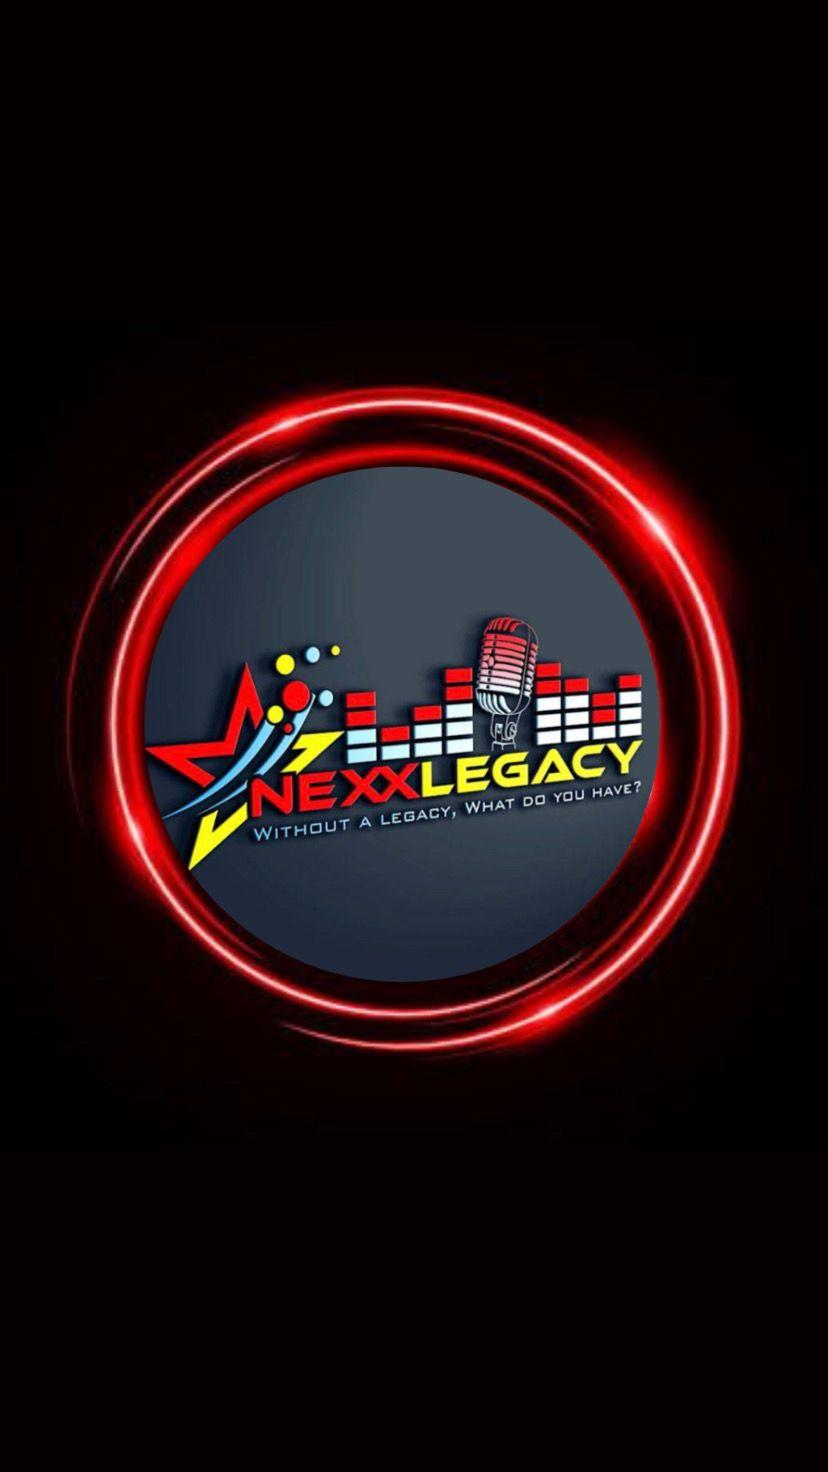 Nexxlegacy Logo